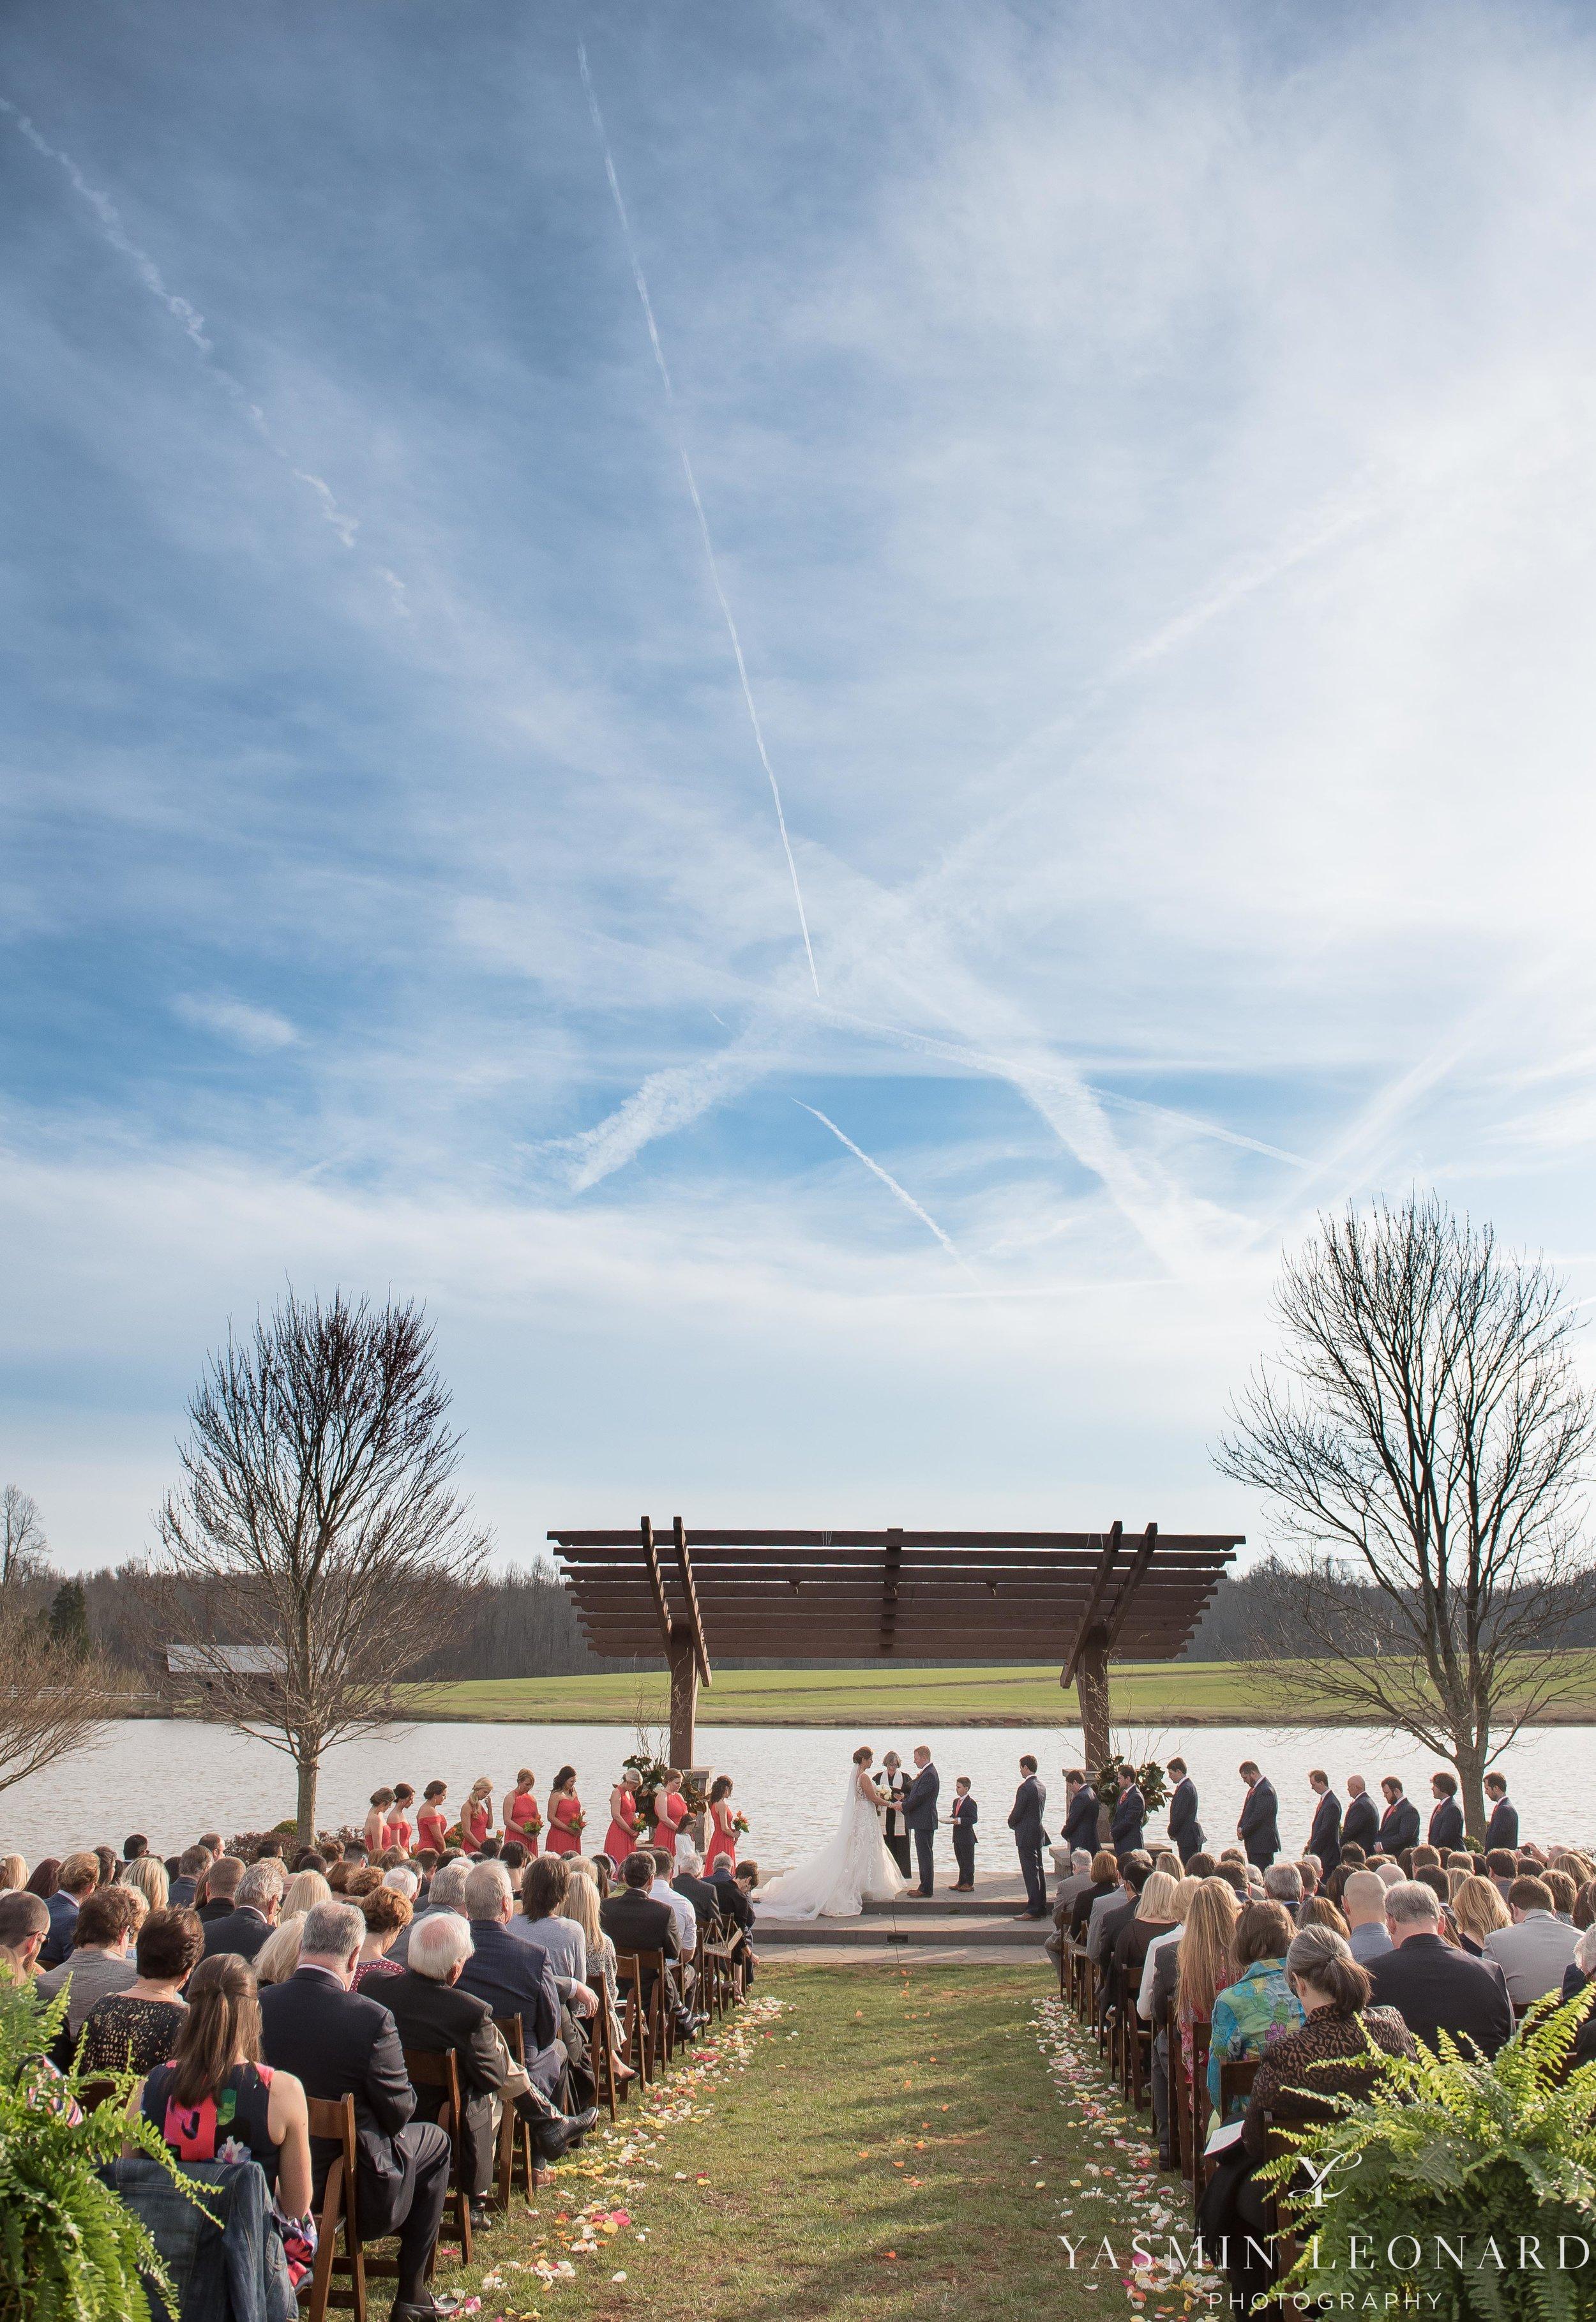 Adaumont Farm - Adaumont Farm Weddings - Trinity Weddings - NC Weddings - Yasmin Leonard Photography-32.jpg